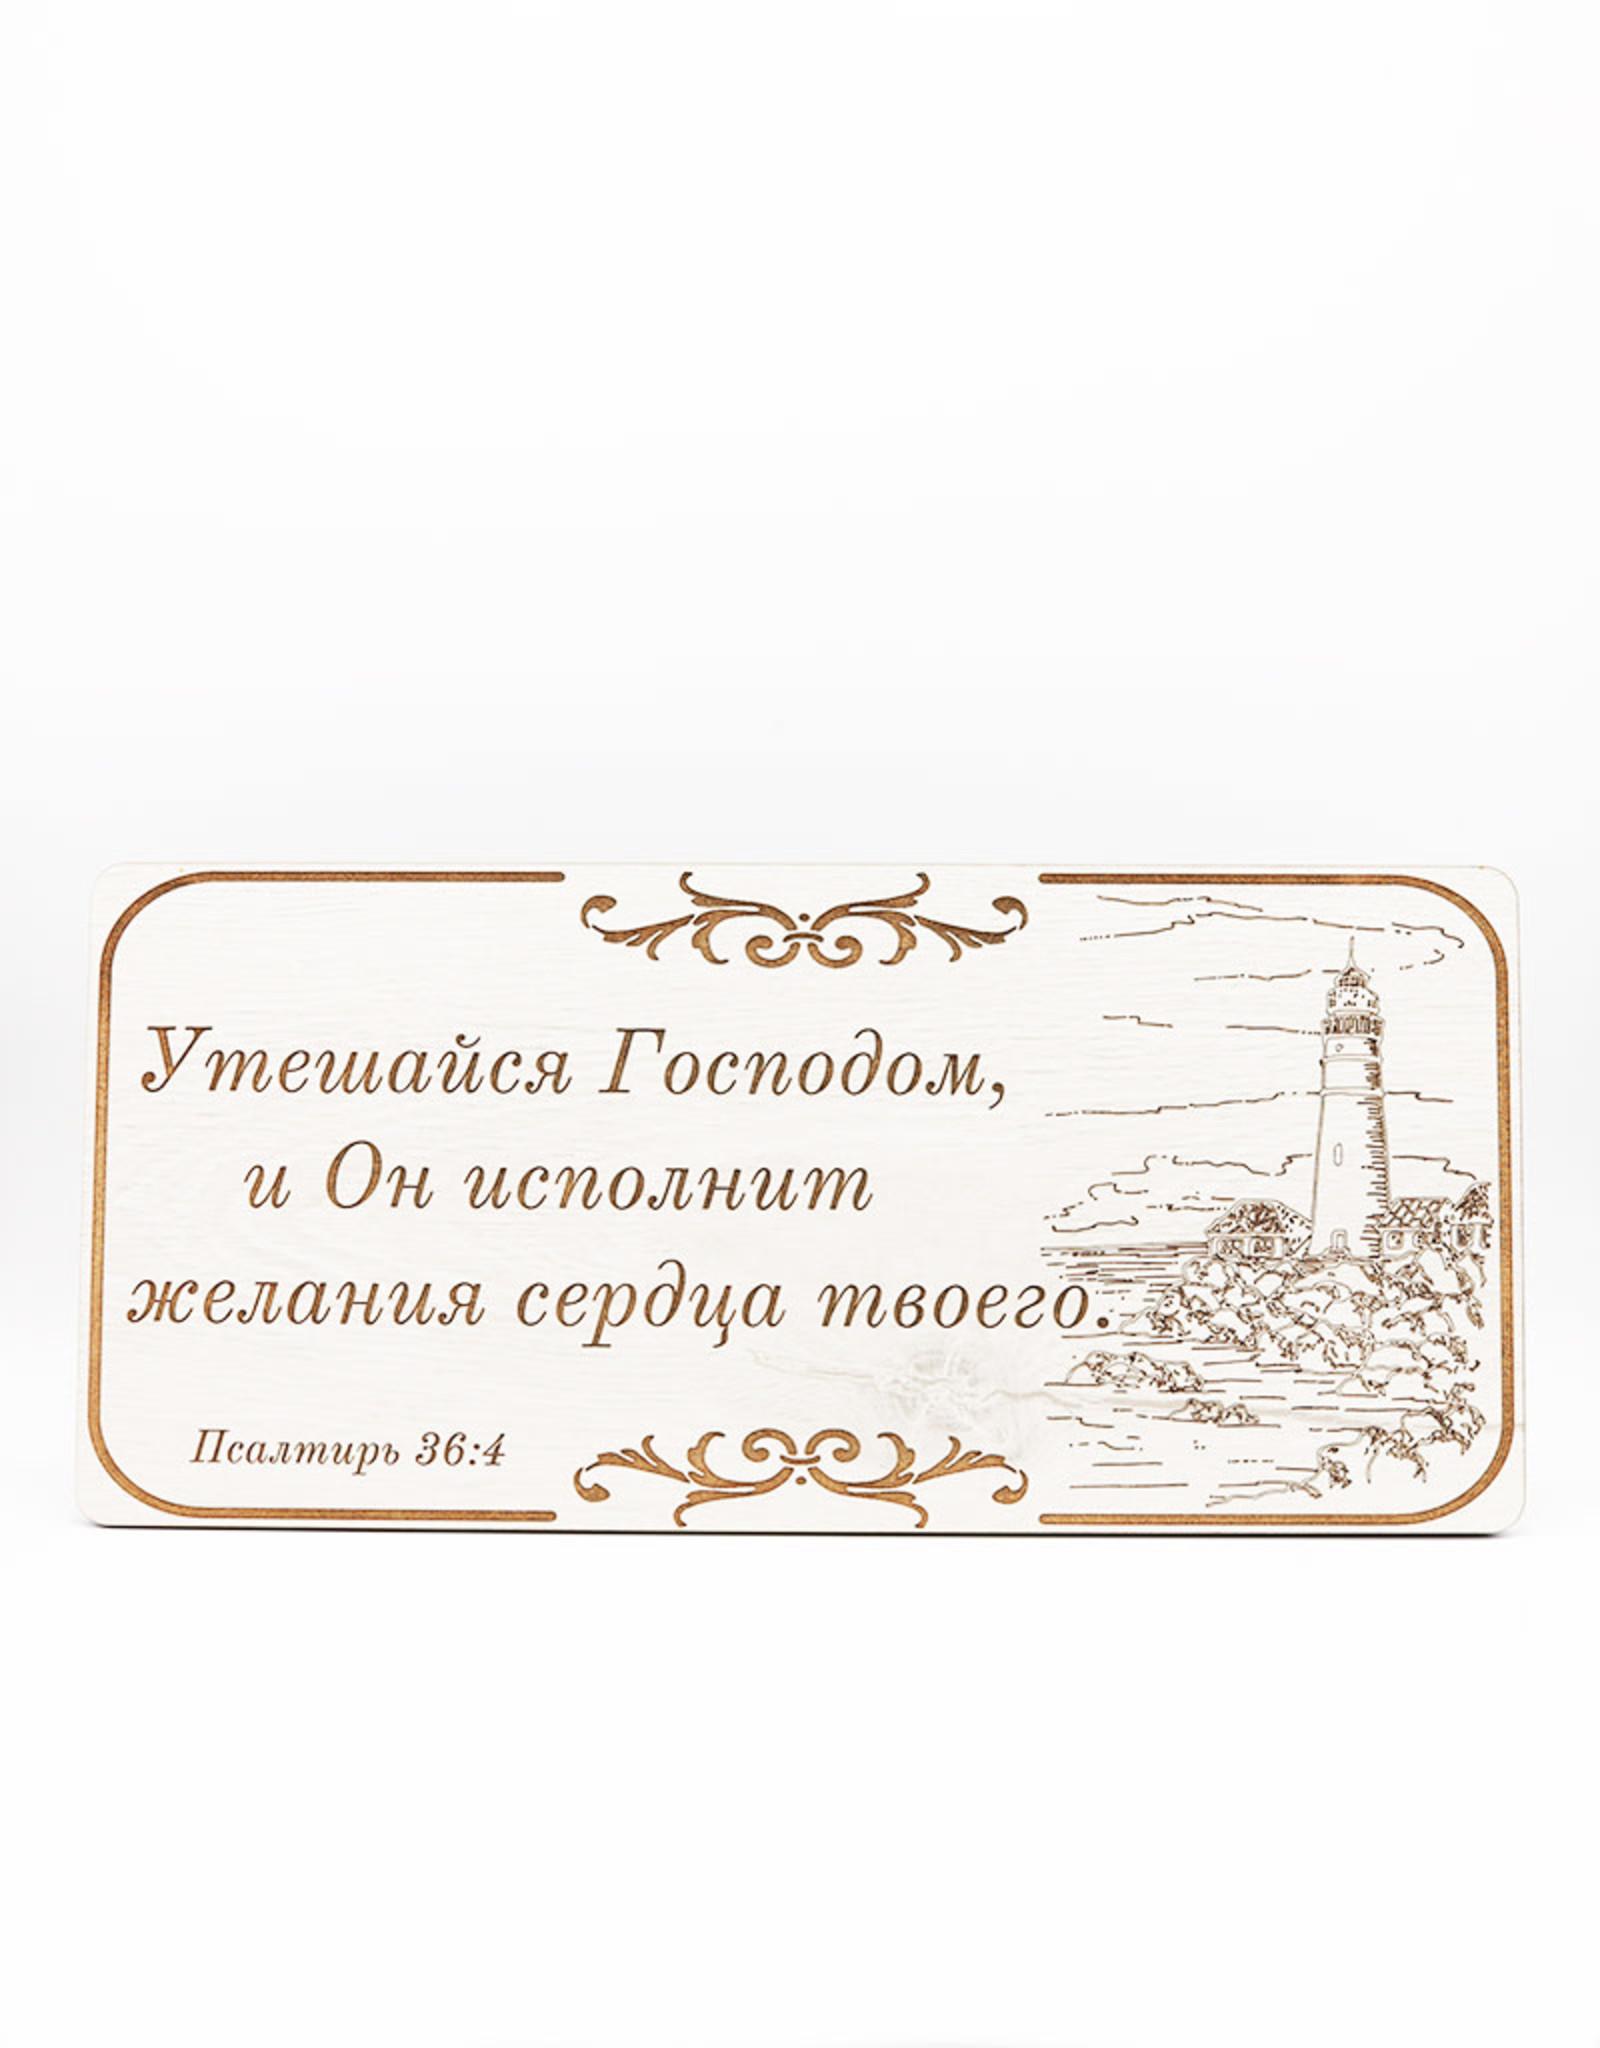 Wood Wall Plaque, Утешайся Господом, Пс. 36:4